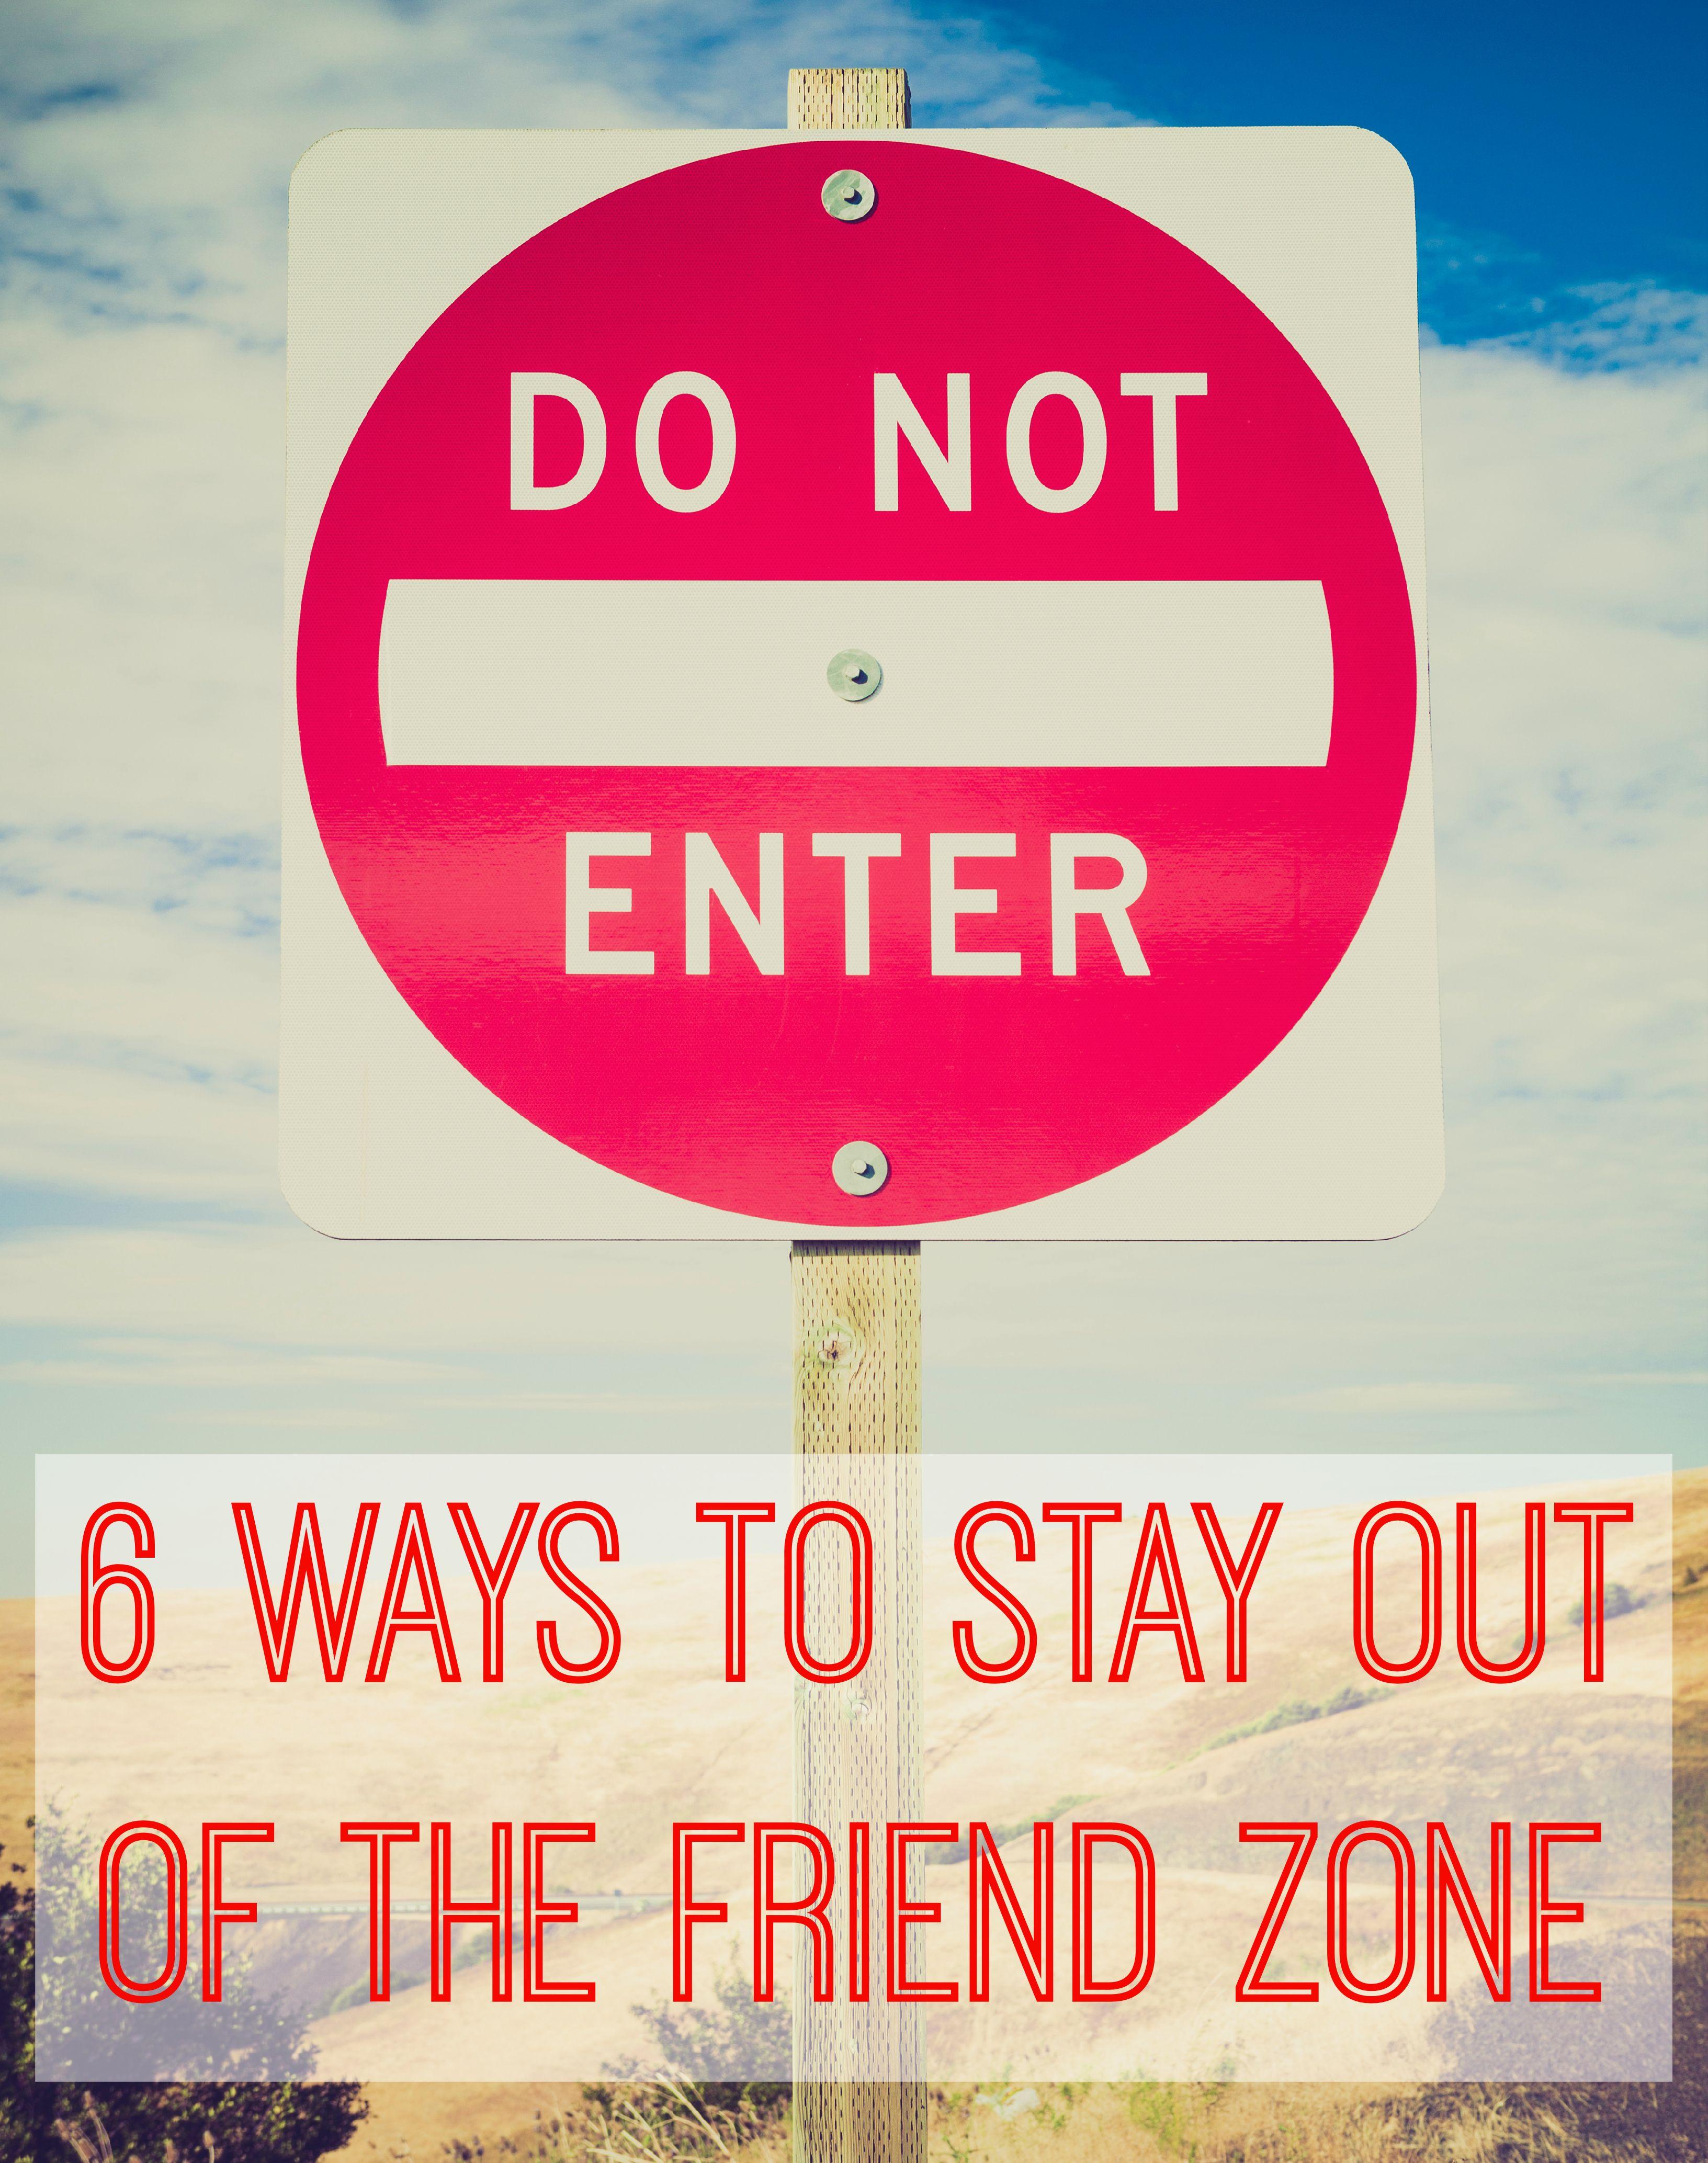 dating advice friend zone online